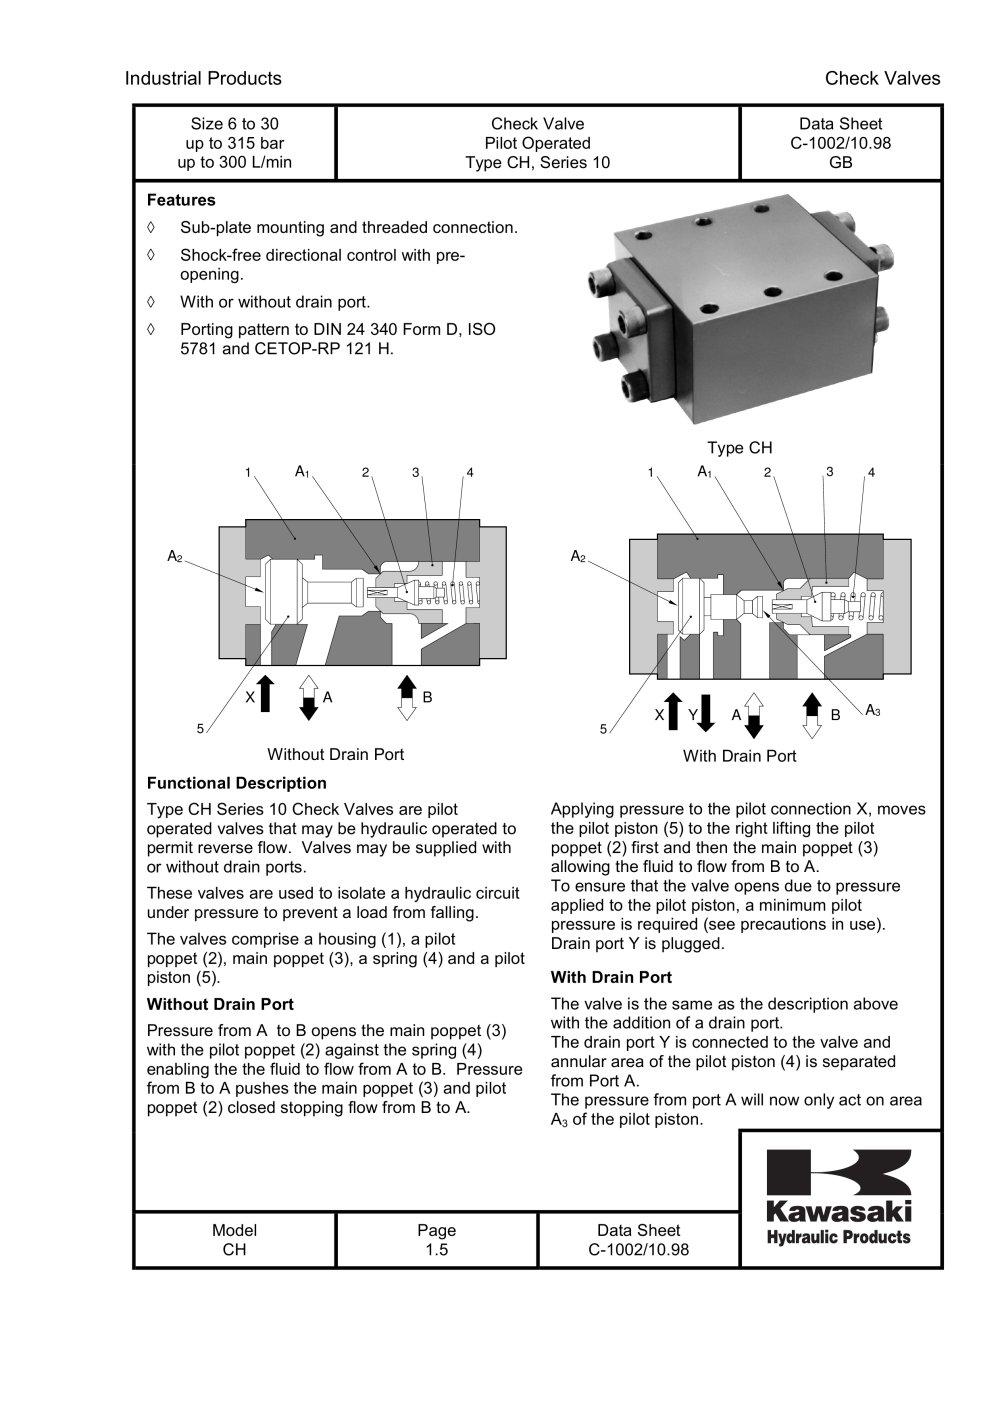 Ch pilot operated check valve kawasaki precision machinery ch pilot operated check valve 1 5 pages biocorpaavc Image collections